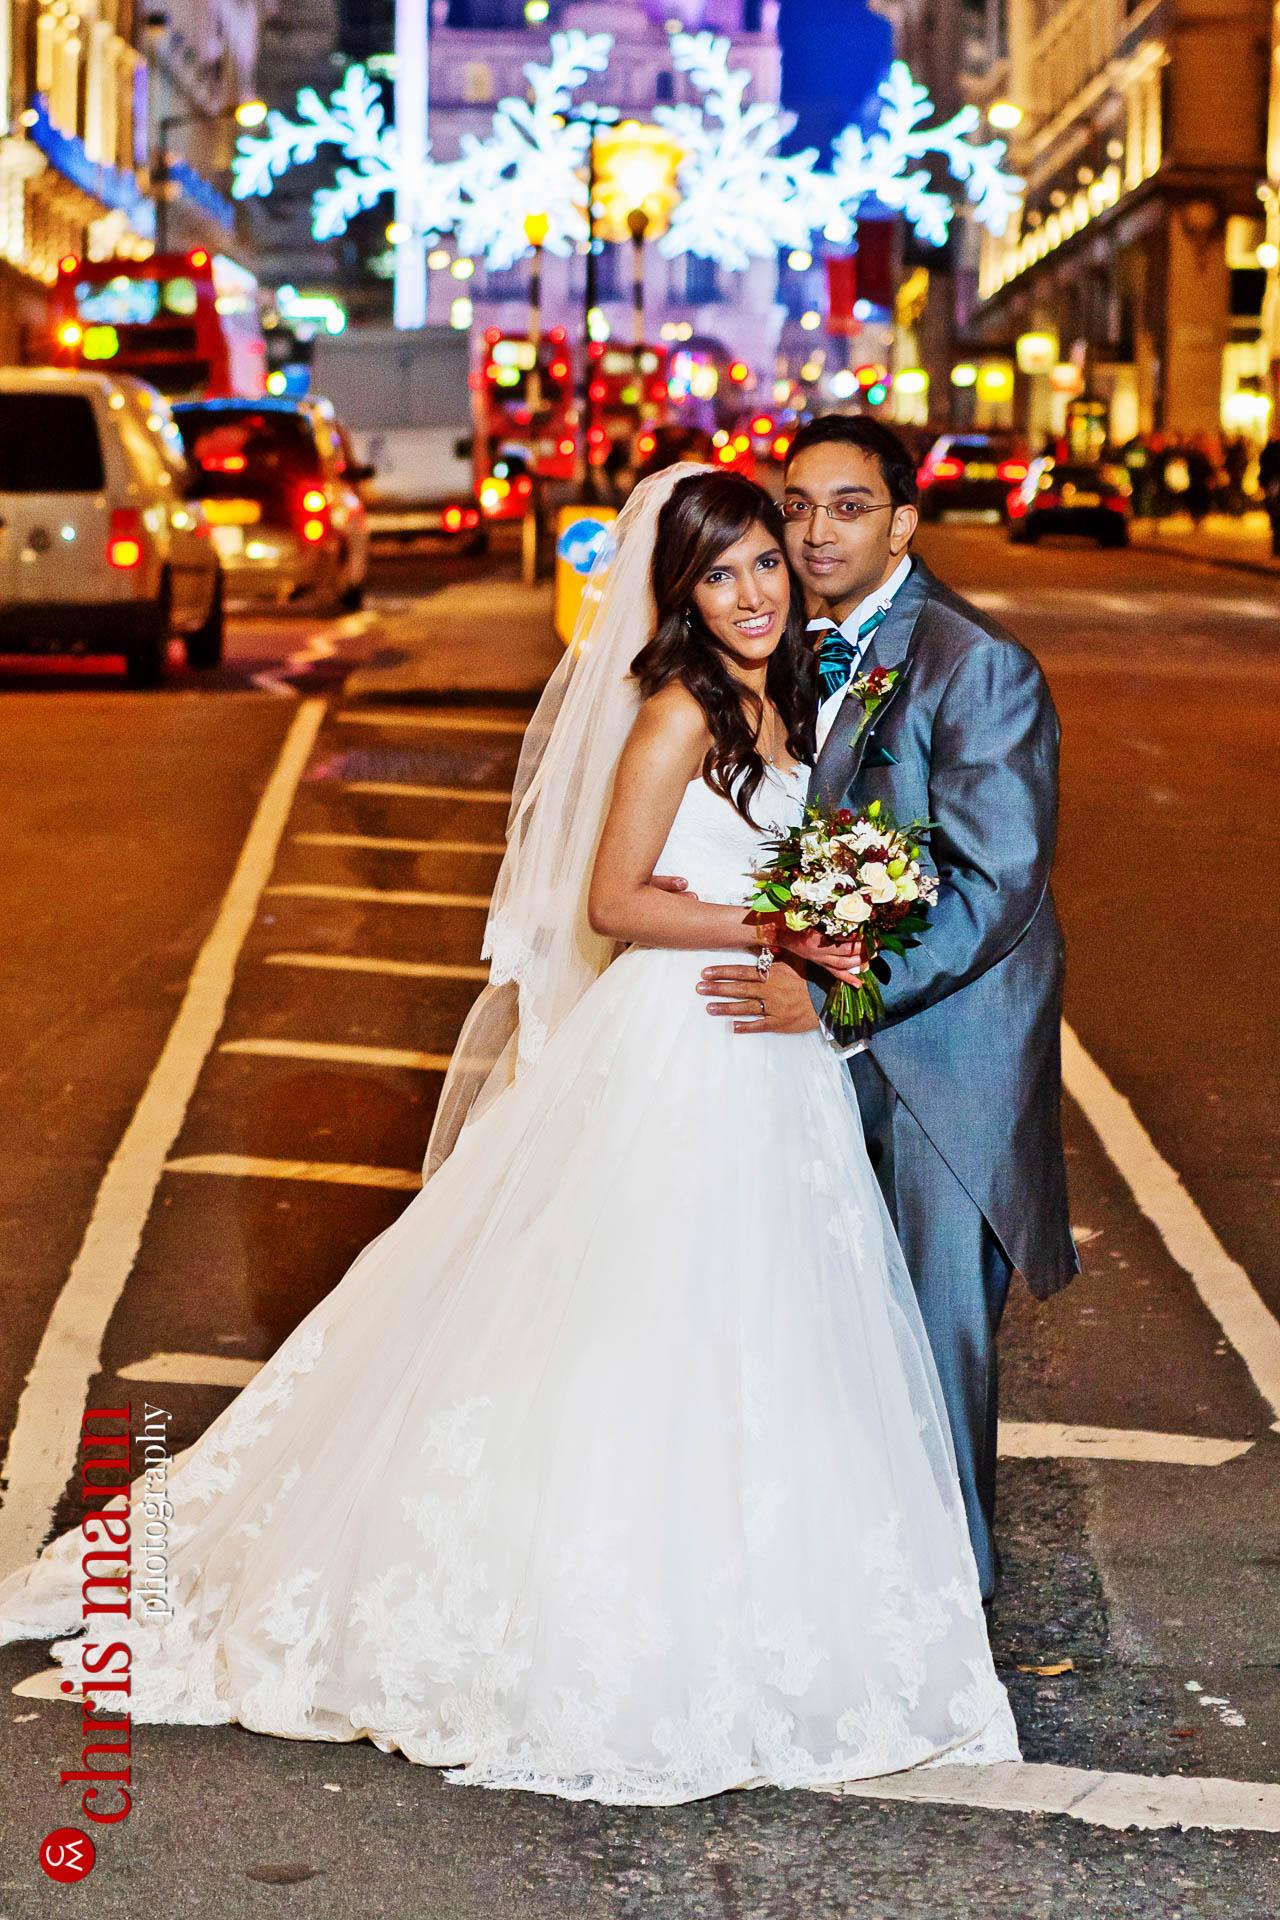 London-Hindu-wedding-IOD-Pall-Mall-036